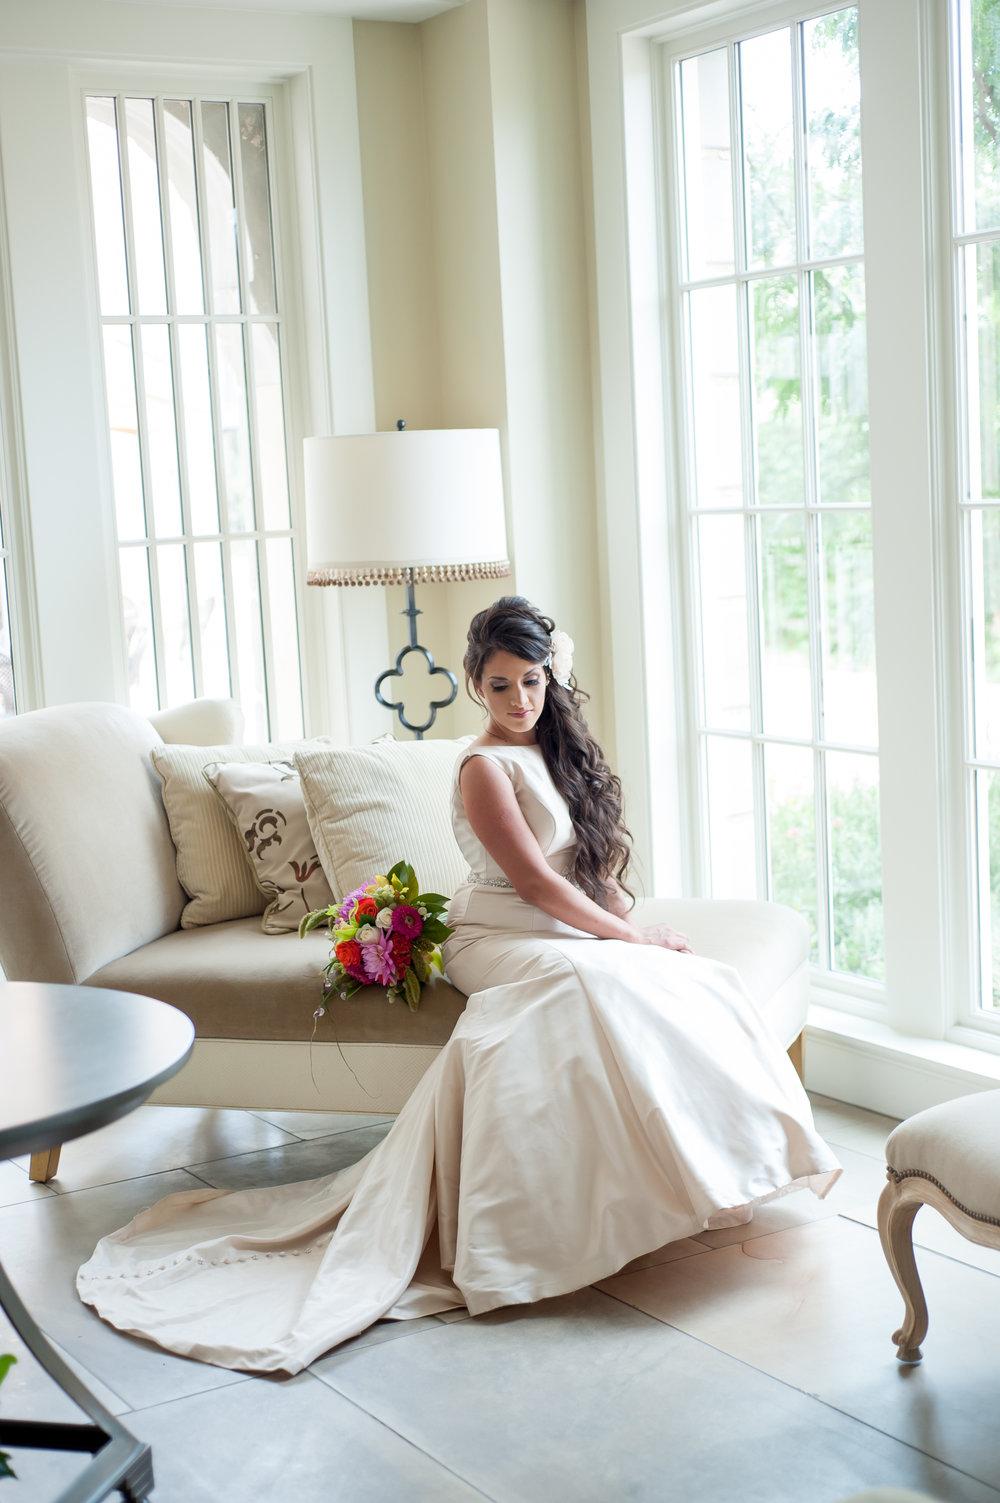 Published in New Mexico Wedding & Event Planner Magazine (cover). Model: Jacqueline Vega. Maura Jane Photography.